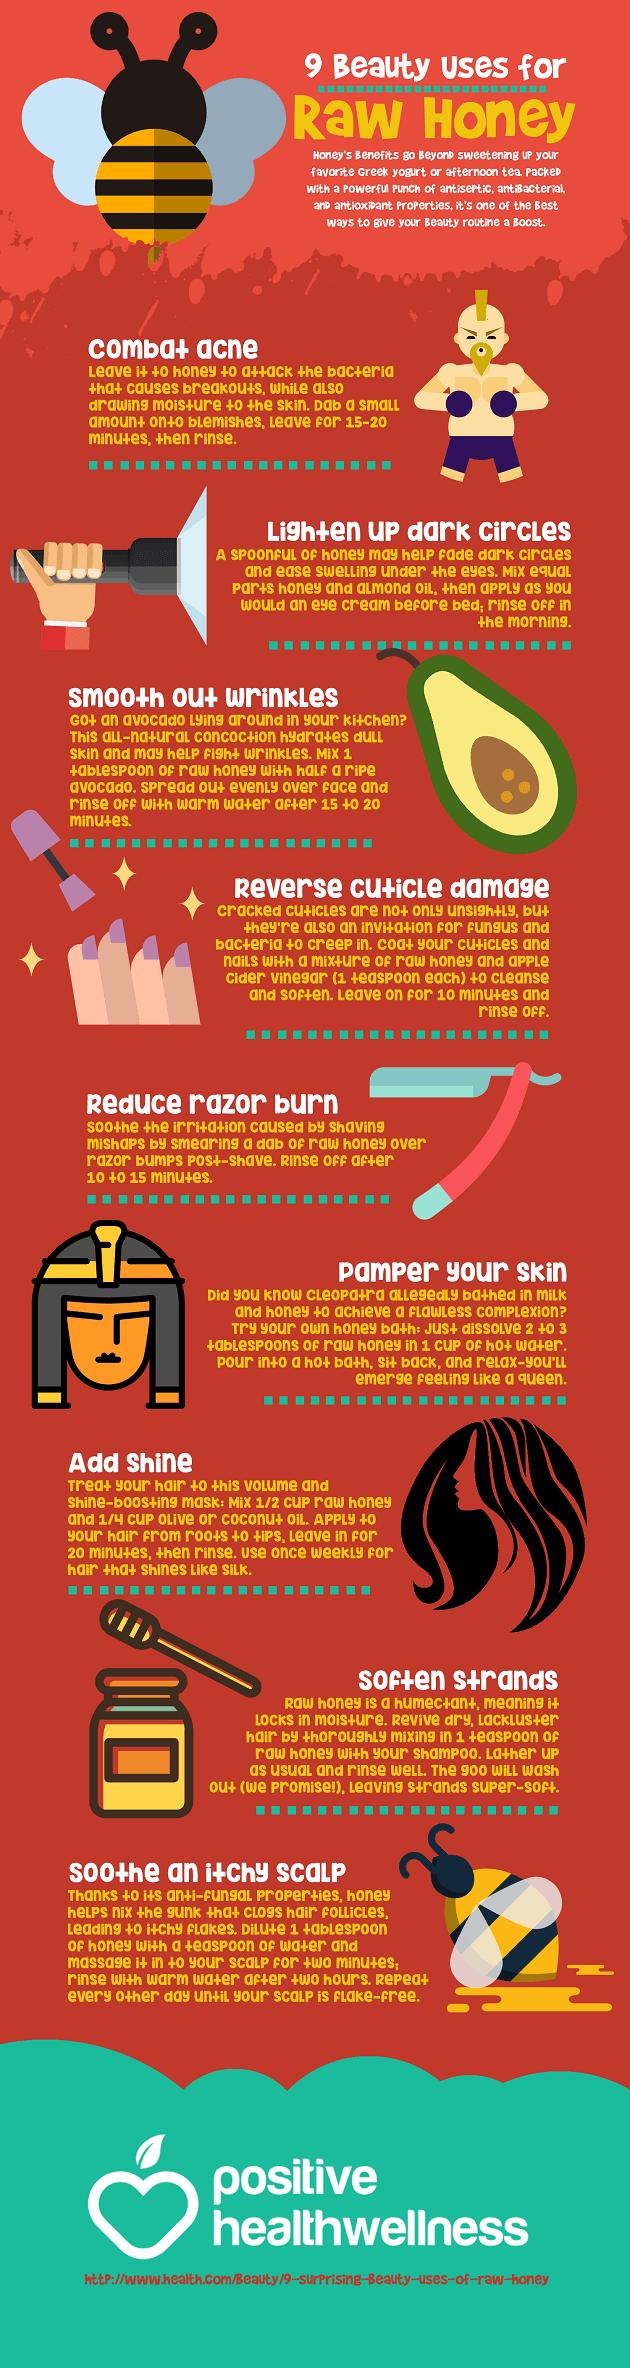 9 Beauty Uses for Raw Honey